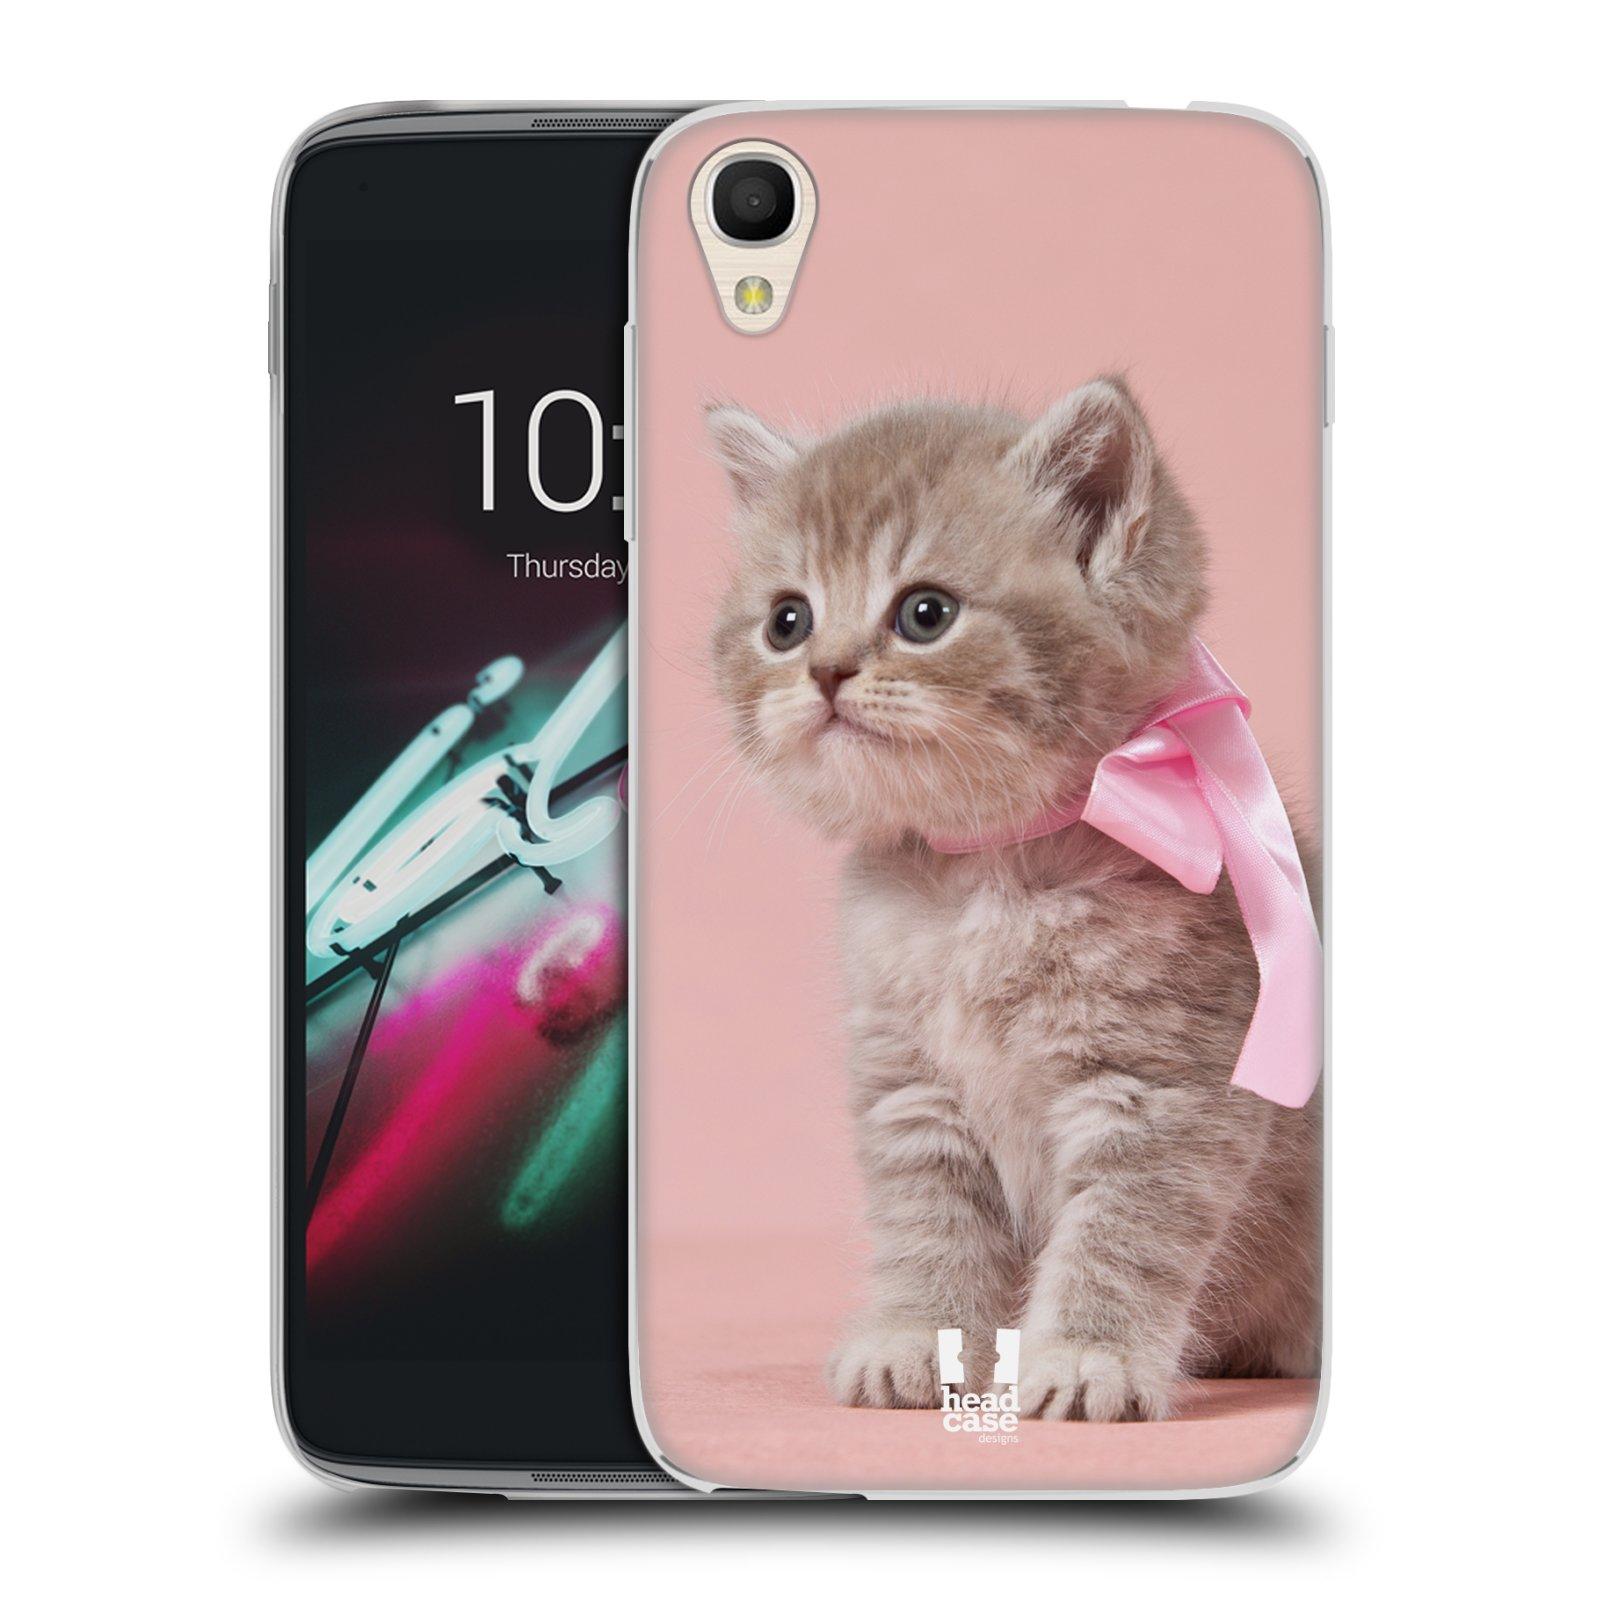 "Silikonové pouzdro na mobil Alcatel One Touch 6039Y Idol 3 HEAD CASE KOTĚ S MAŠLÍ (Silikonový kryt či obal na mobilní telefon Alcatel One Touch Idol 3 OT-6039Y s 4,7"" displejem)"